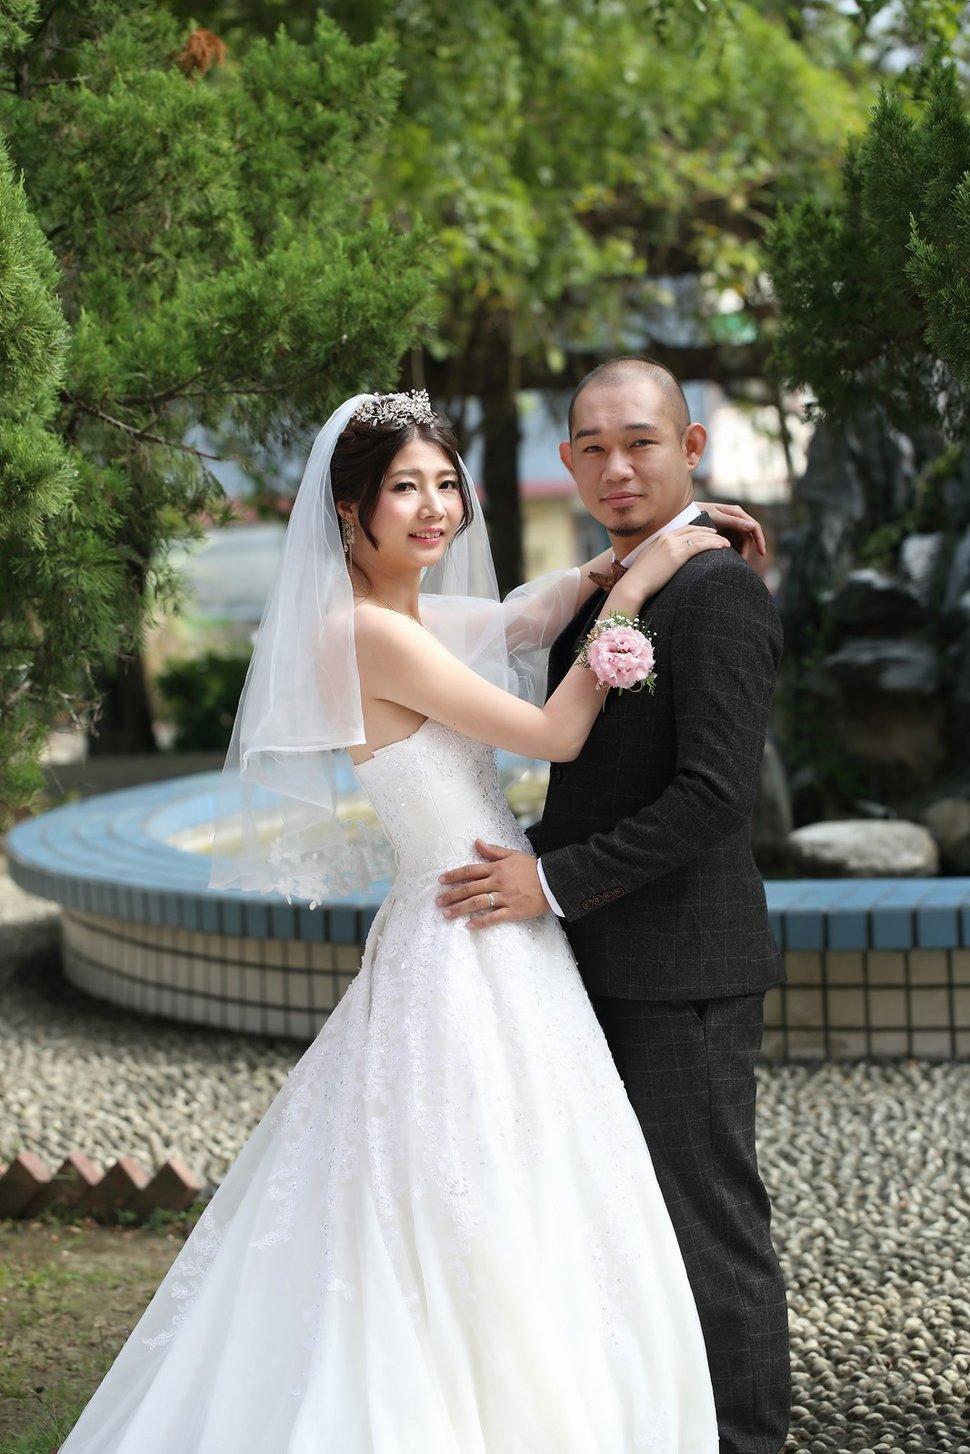 DPP_1426 - 頭頭-photo studio 專業攝影《結婚吧》